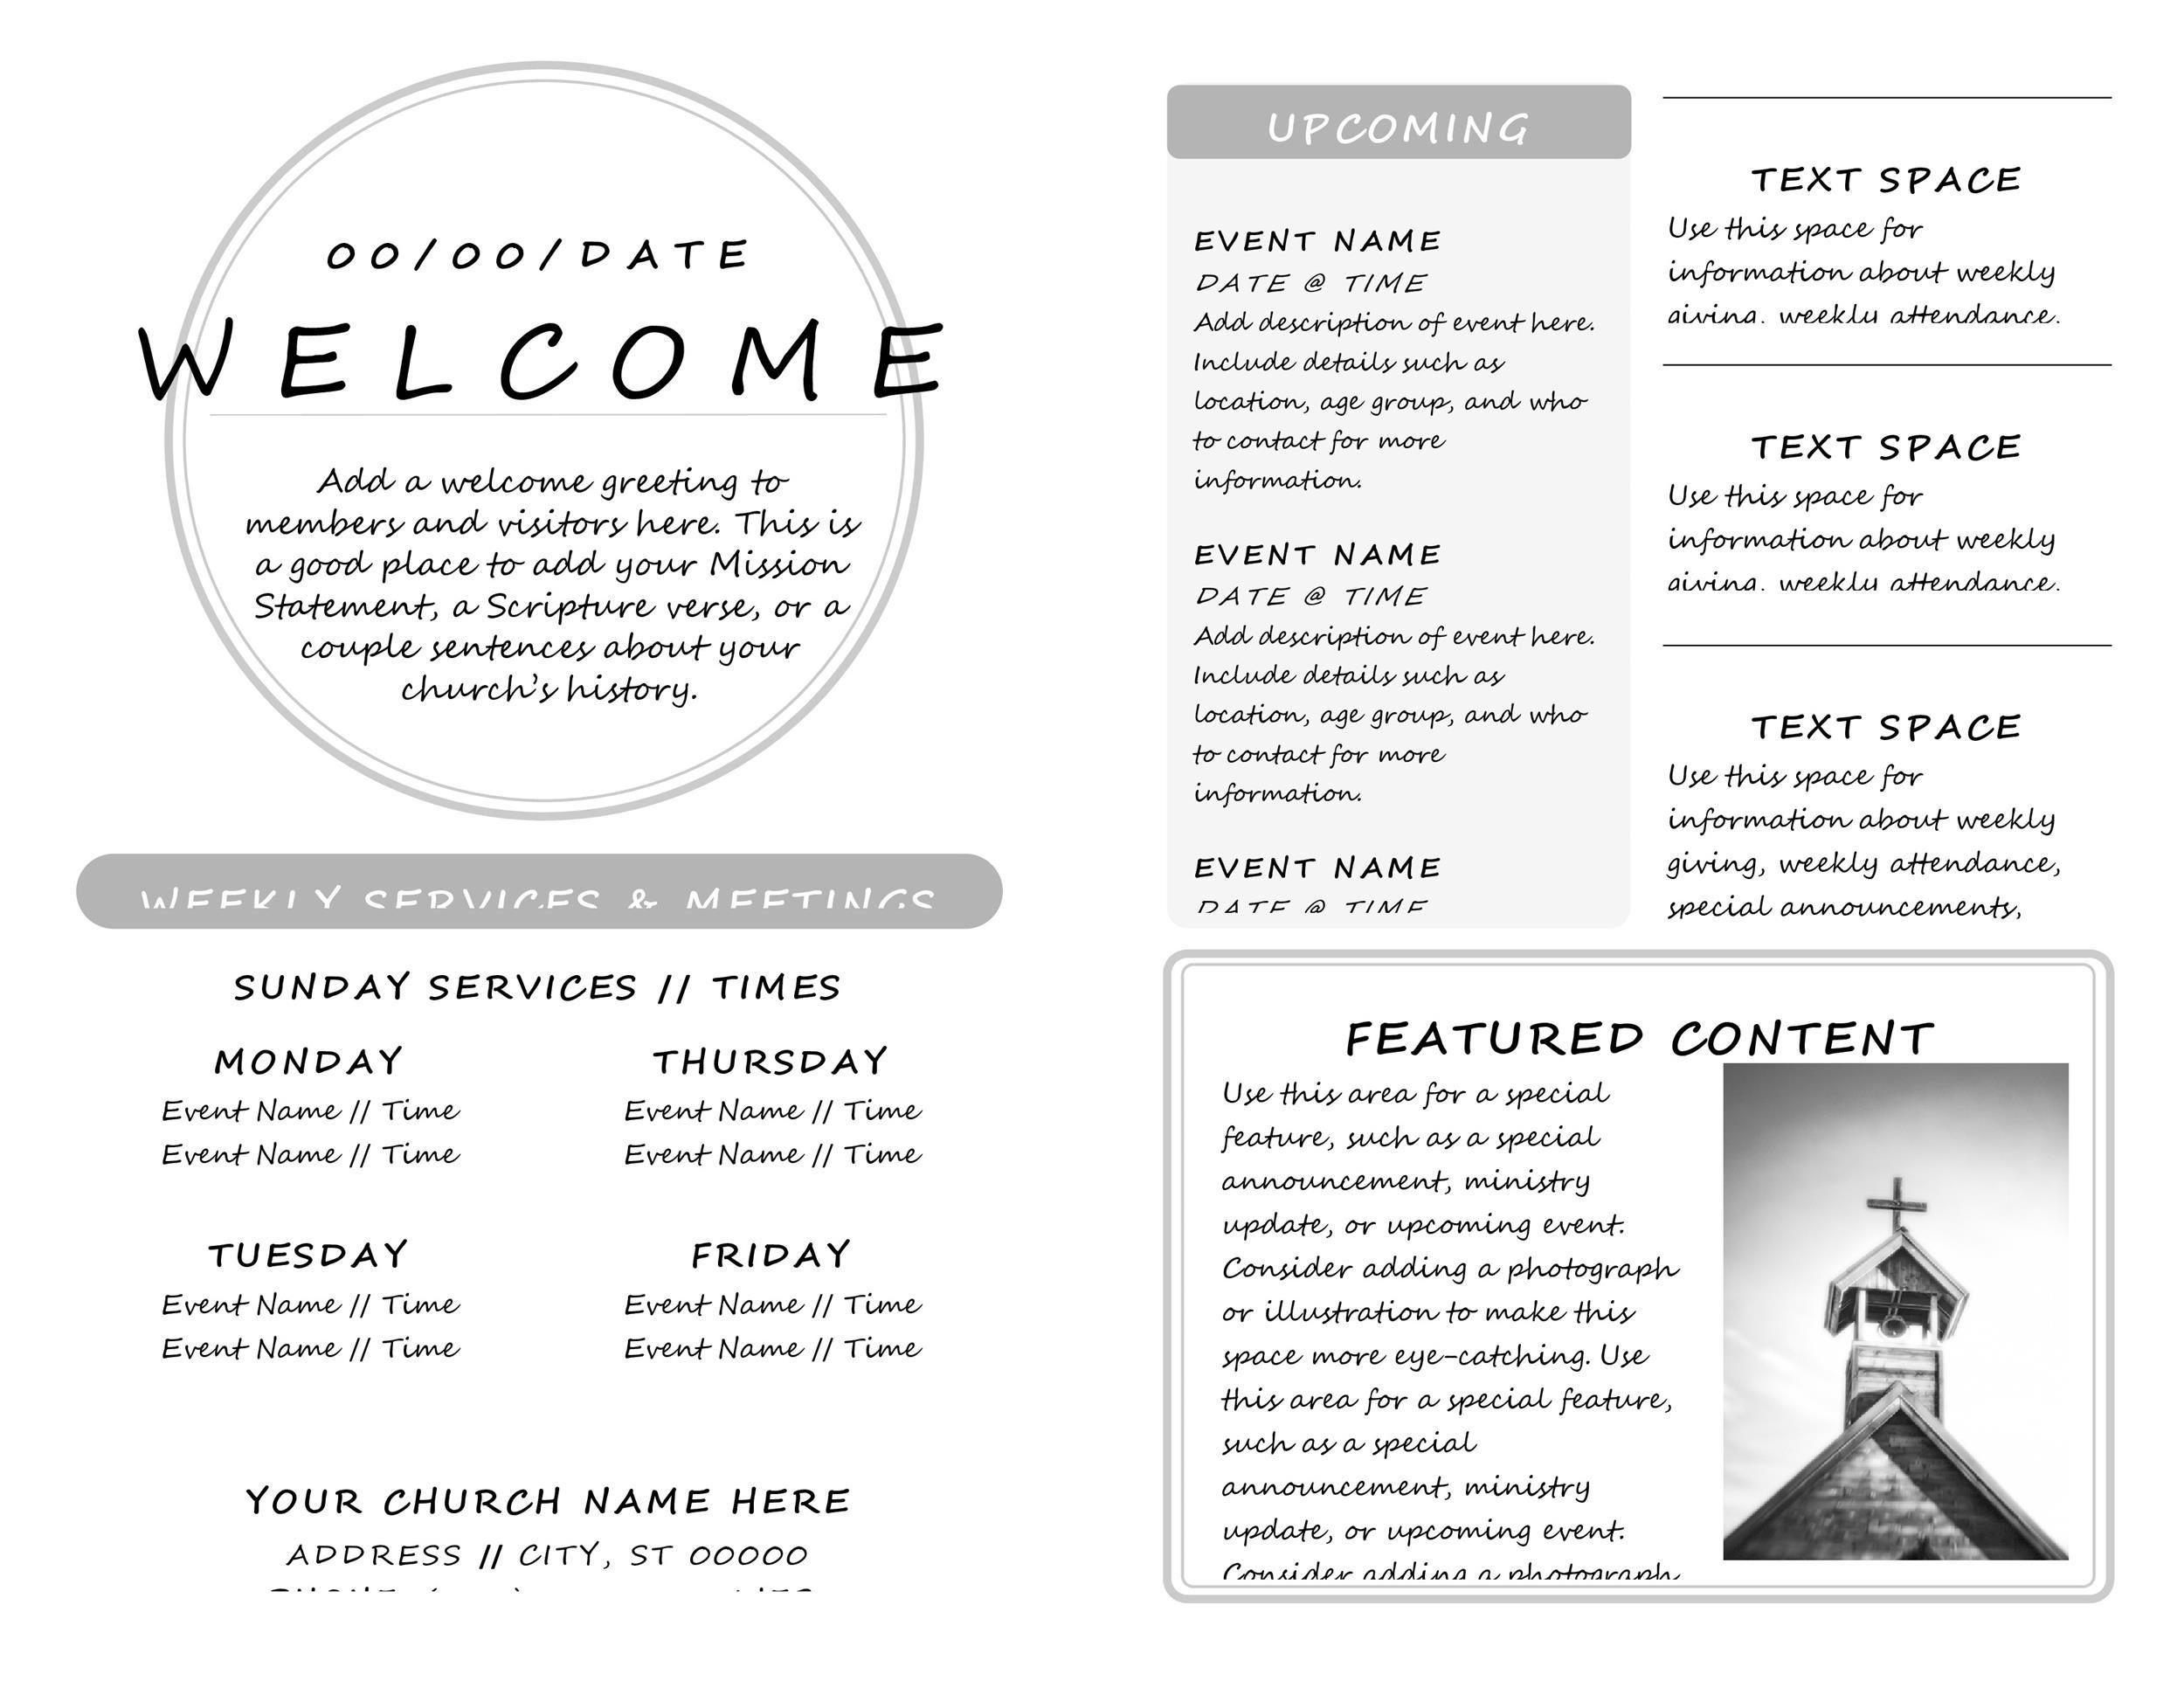 006 Impressive Free Church Program Template Download Image  Downloads BulletinFull